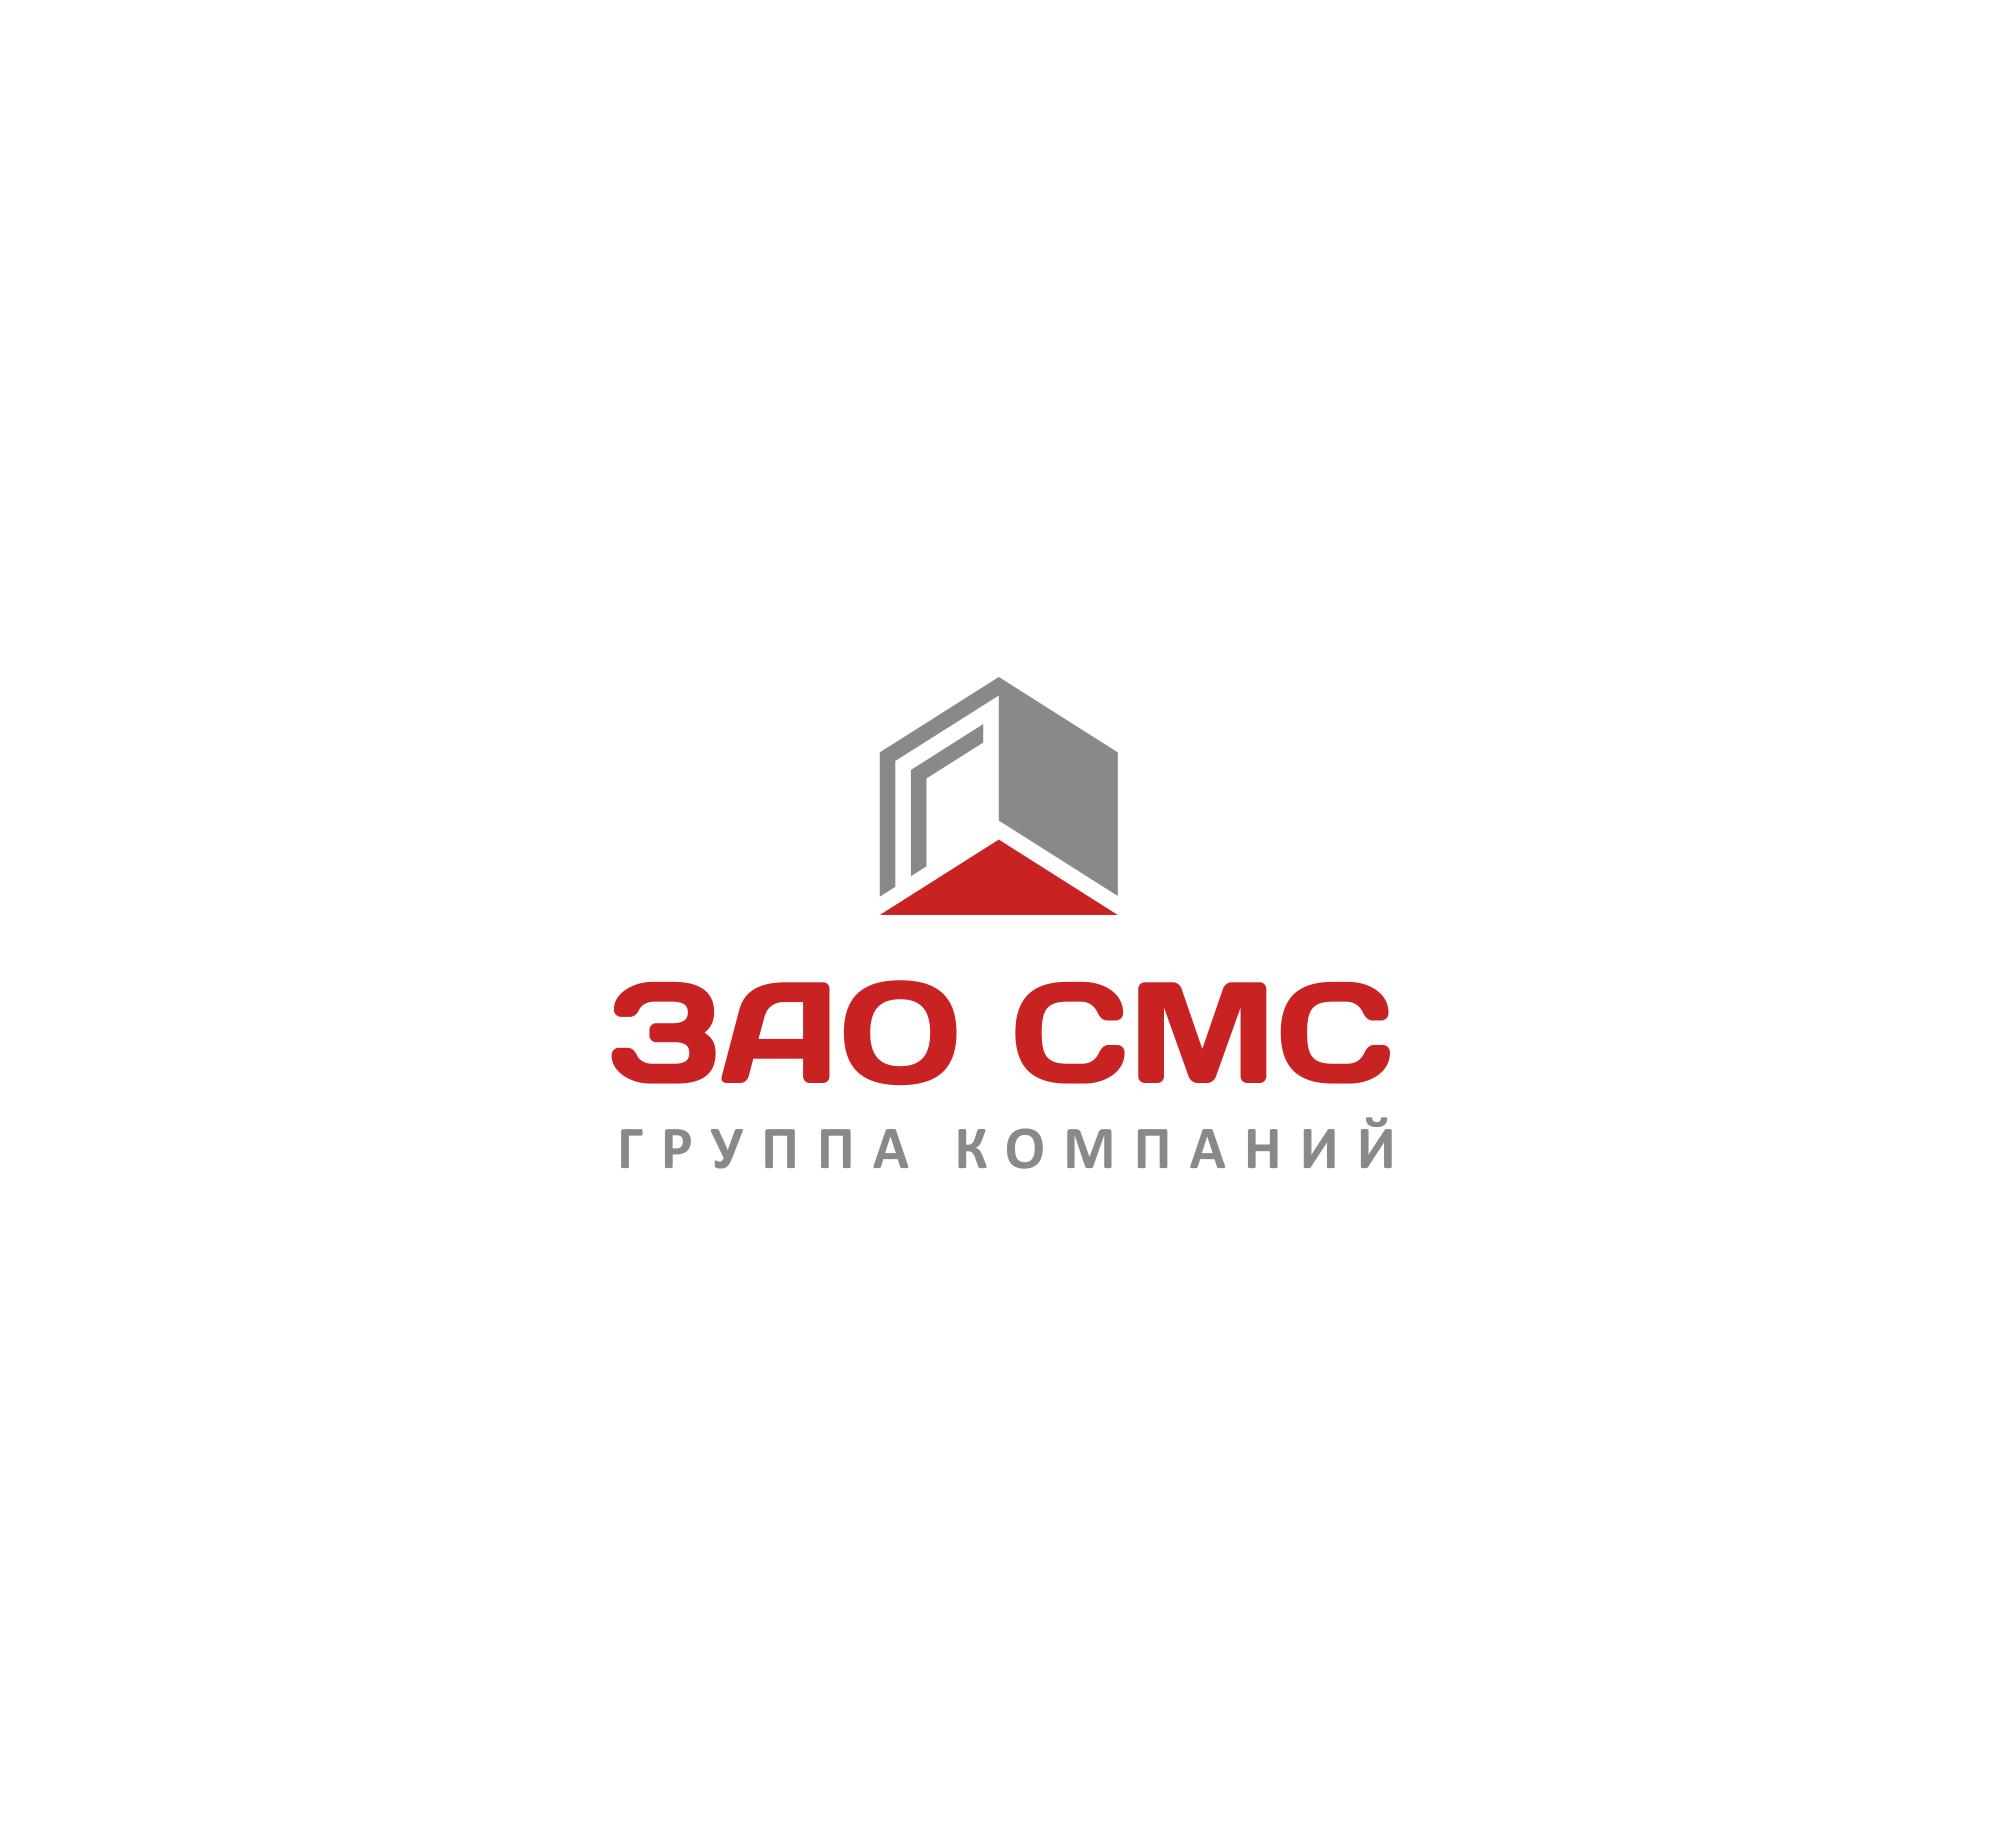 Дизайнер для разработки Логотипа для организации !СРОЧНО! фото f_1845a26e1bc6cc14.png